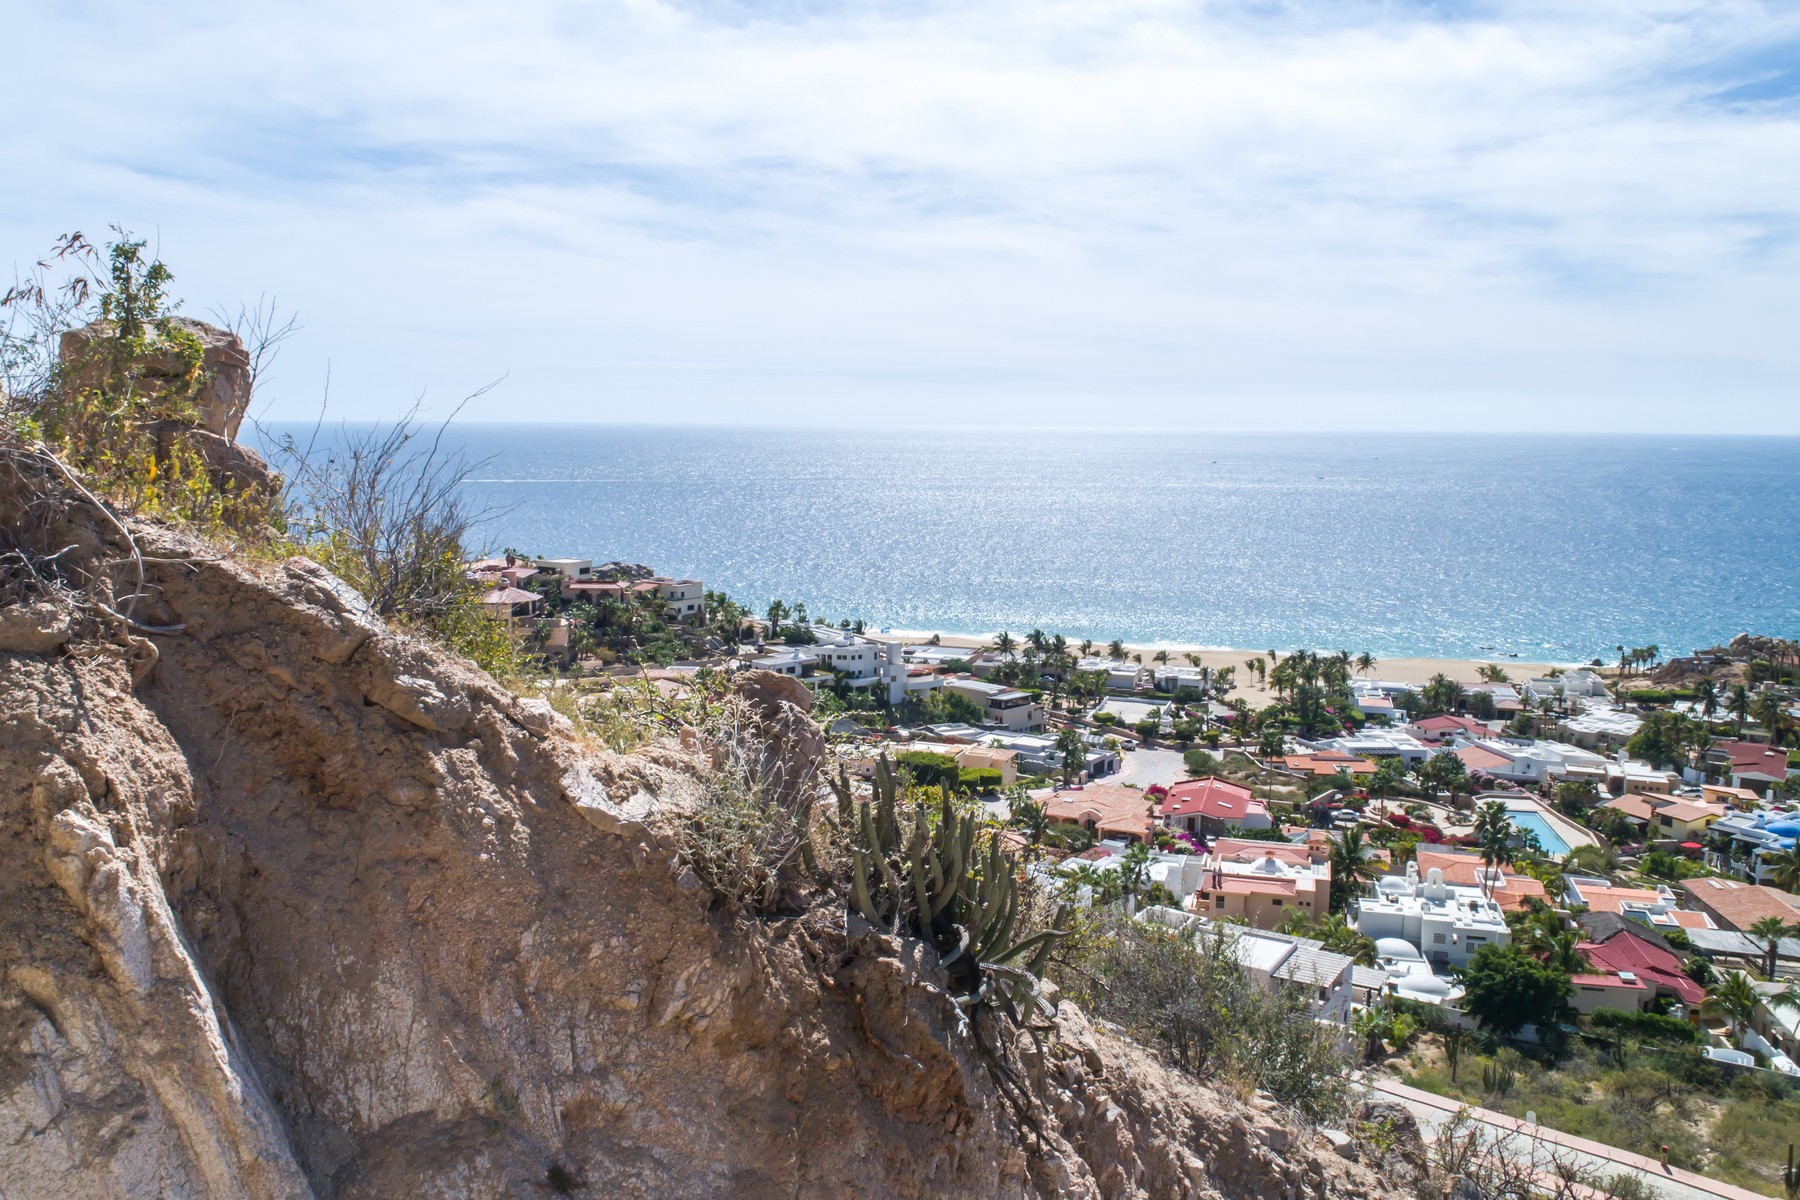 Additional photo for property listing at Lote Pedregal Camino del Sol 25 Lote #25 Manzana 36, Calle Camino del Sol Pedregal de Cabo San Lucas Cabo San Lucas, Baja California Sur 23453 México